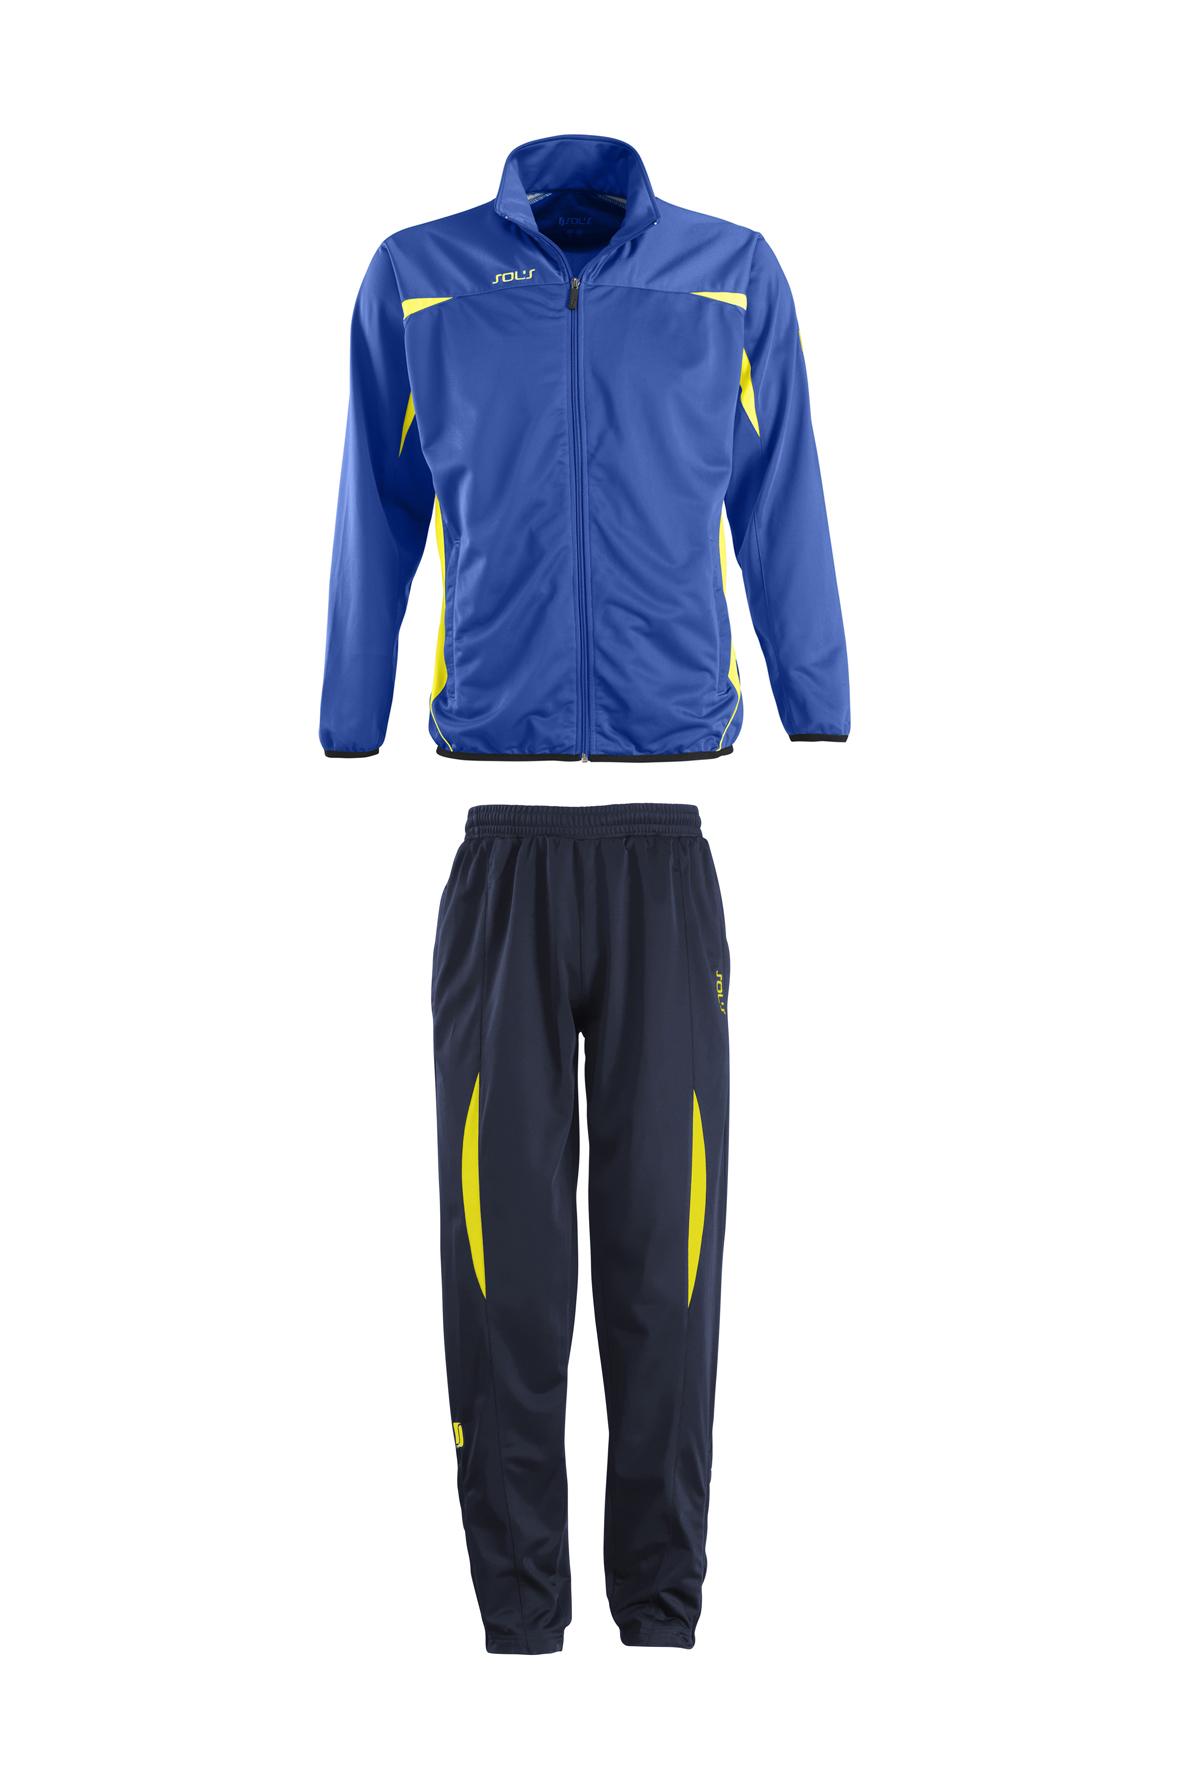 Camp Nou - Royal Blue/Lemon/Navy - S